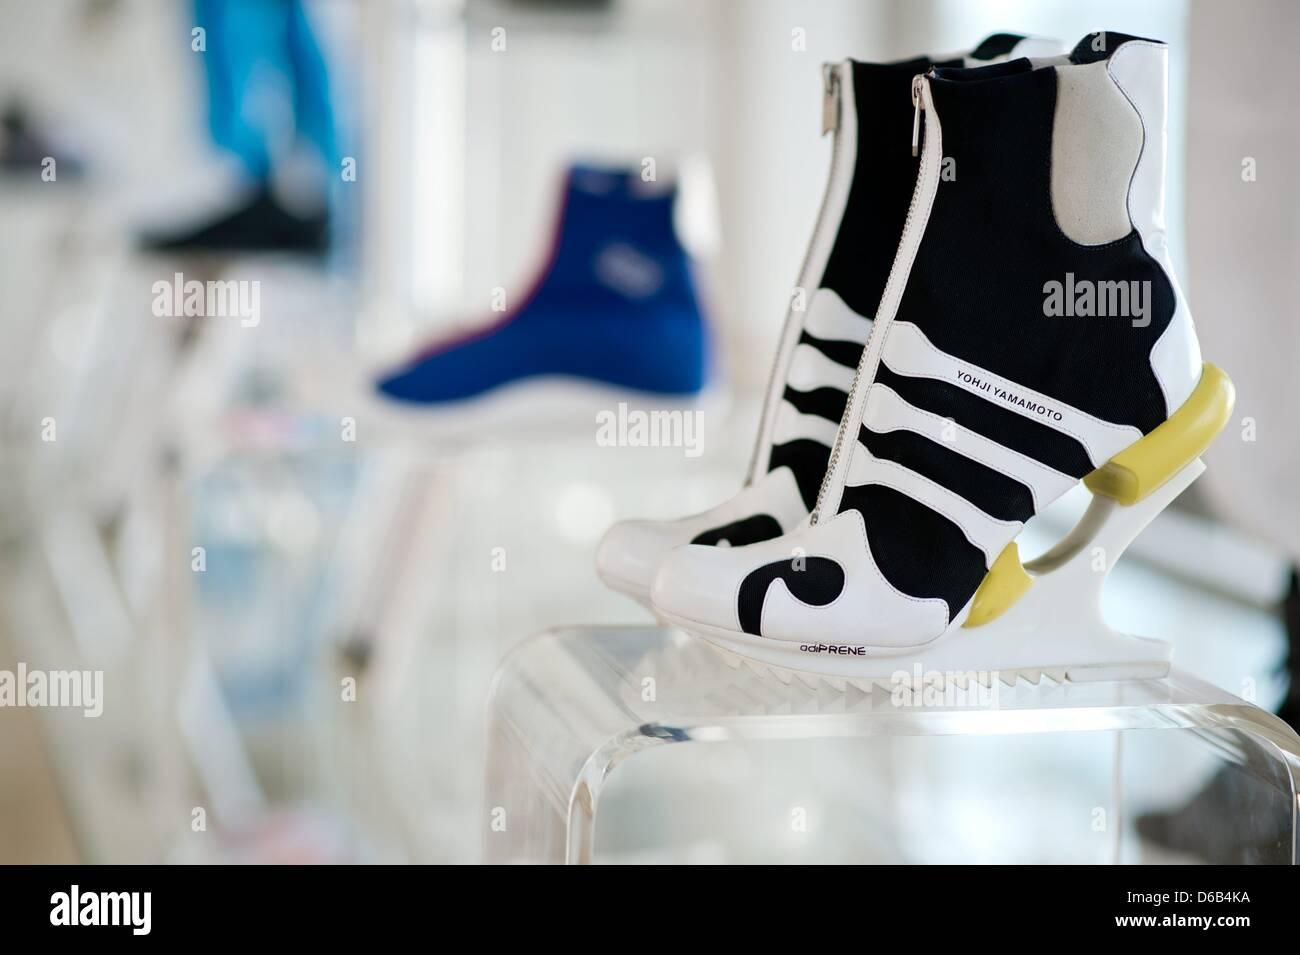 7728f08ba3793 Futuristic Adidas women s shoes by designer Yohji Yamamoto are displayed at  company headquarters in Herzogenaurach